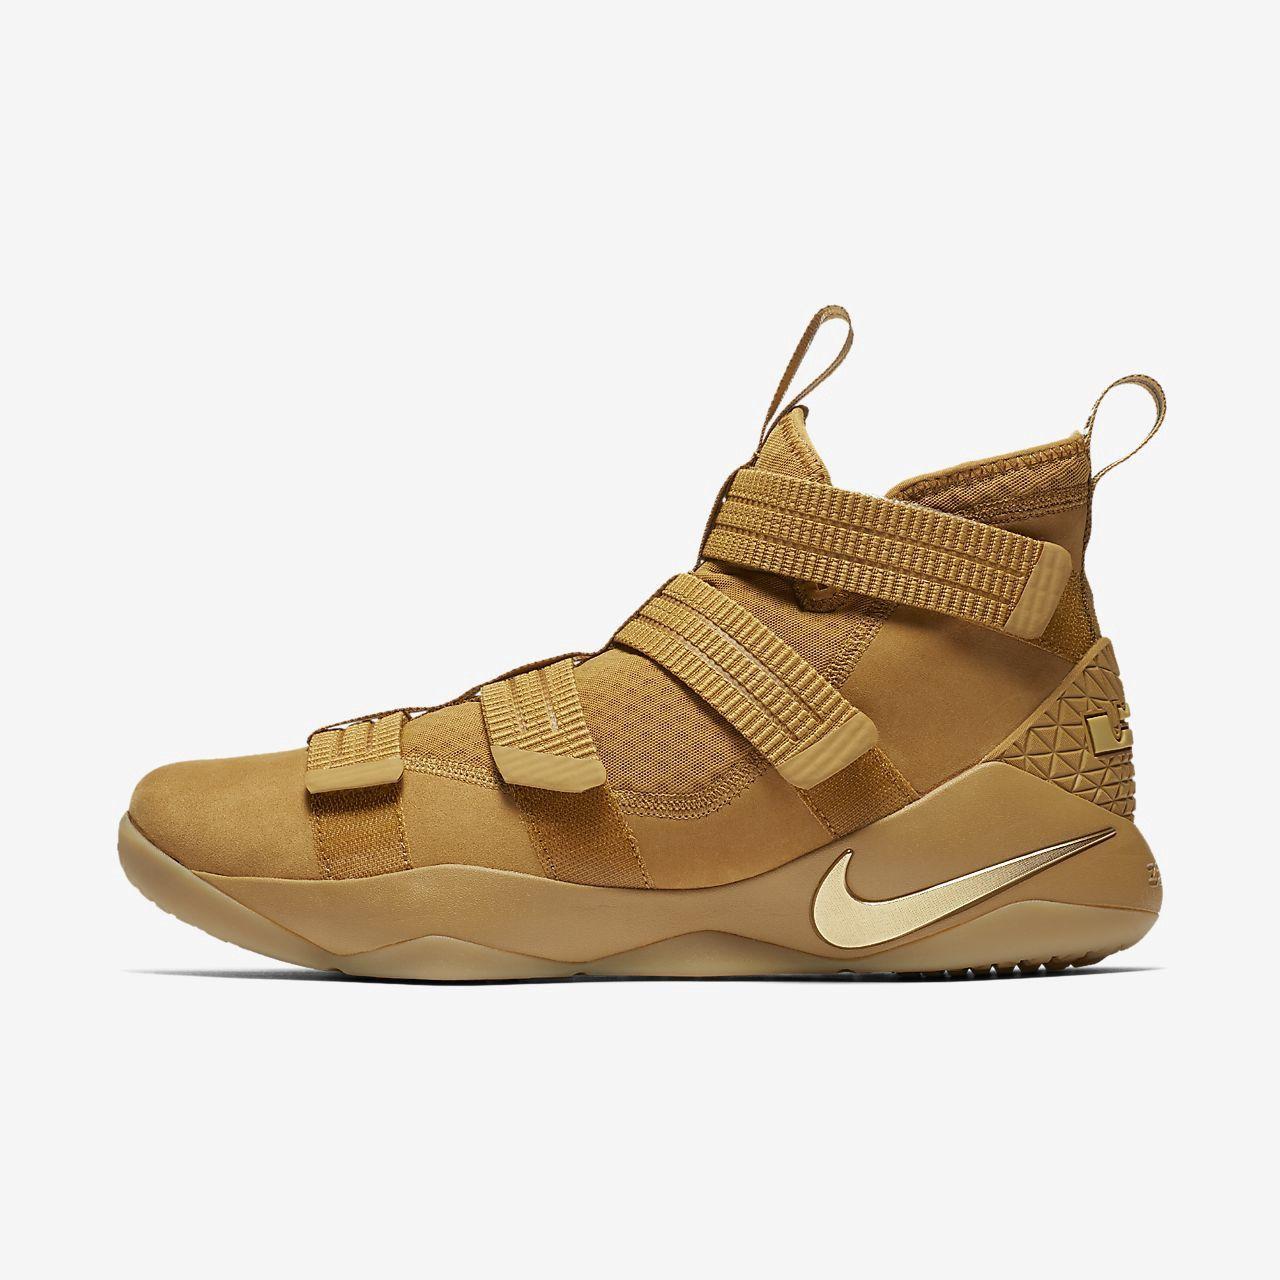 752ca3857627 Nike Lebron Soldier Xi Sfg Basketball Shoe - M 9   W 10.5